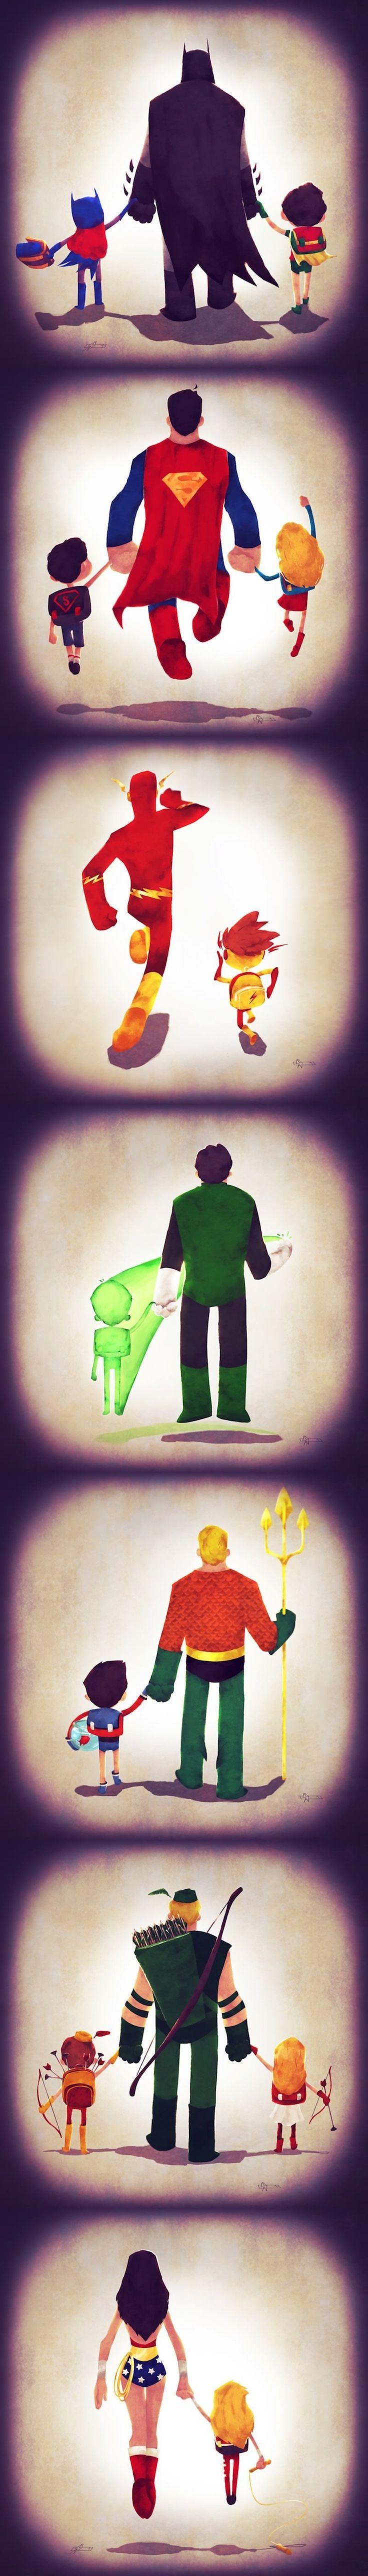 pais herois dc comics - http://elshangowuzhere.blogspot.fr/